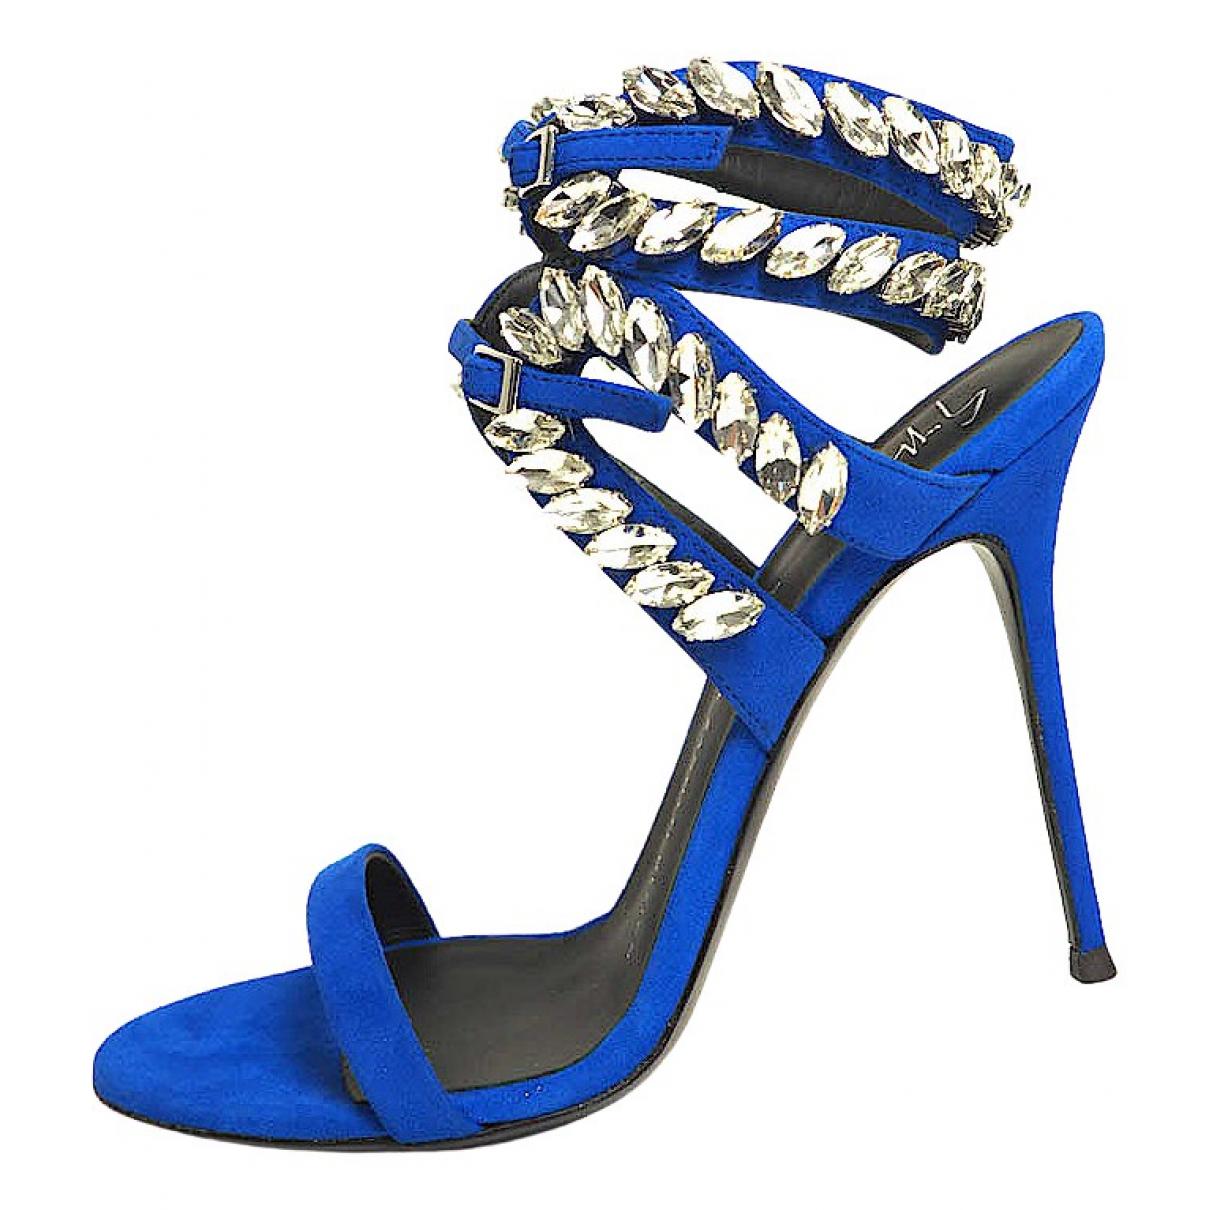 Giuseppe Zanotti - Sandales   pour femme en cuir - bleu